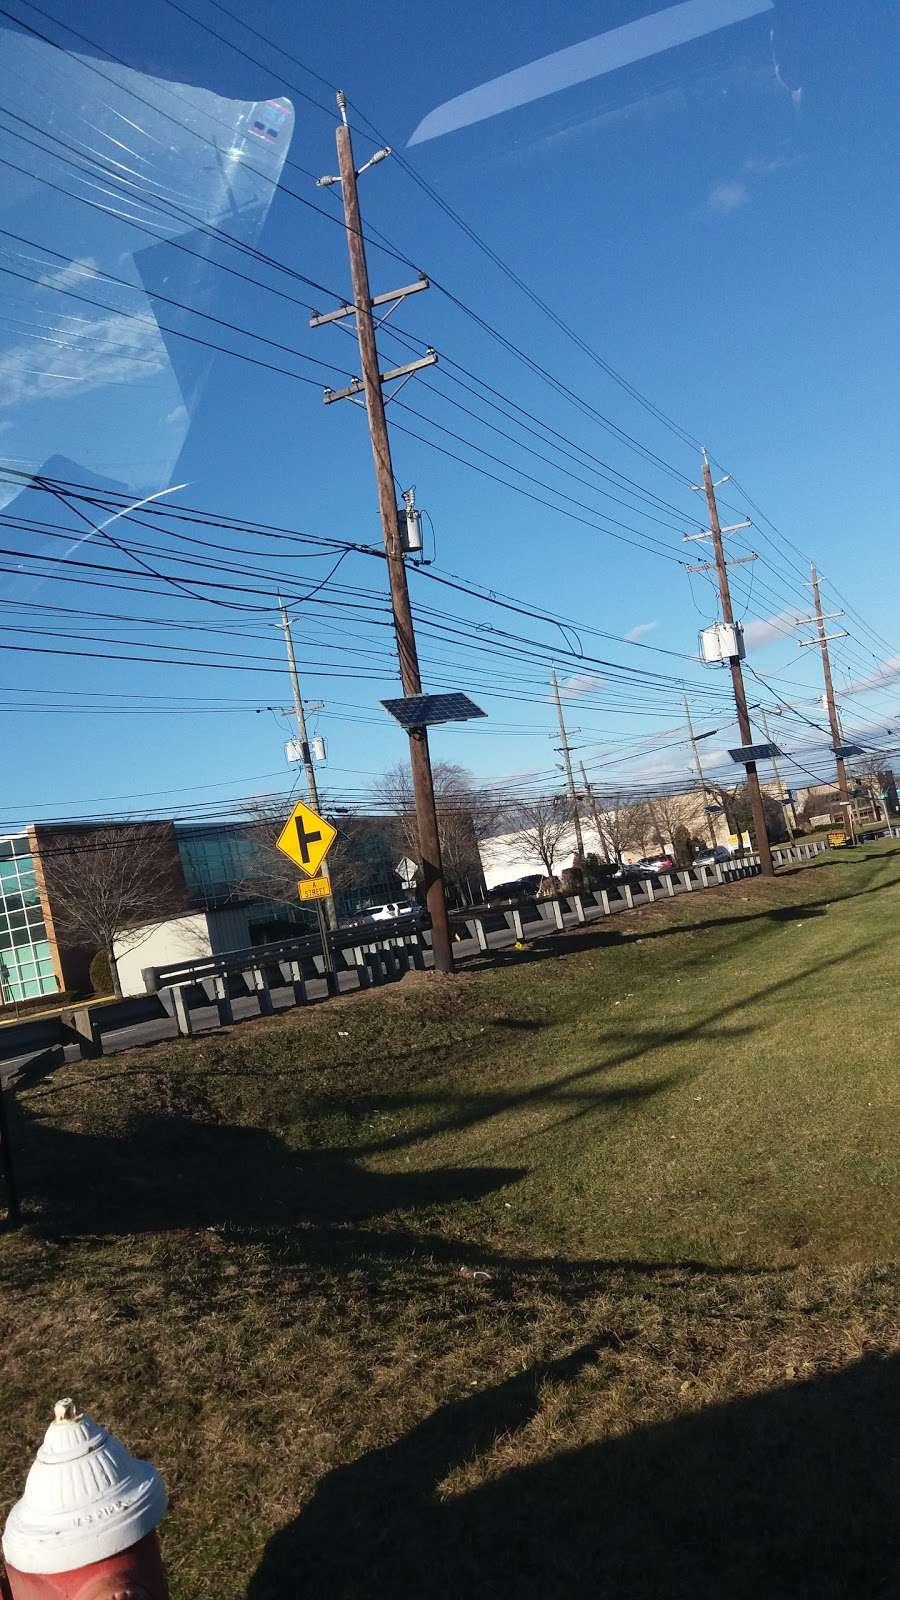 Michael Halebian Inc - home goods store  | Photo 8 of 8 | Address: 557 Washington Ave, Carlstadt, NJ 07072, USA | Phone: (201) 935-3535